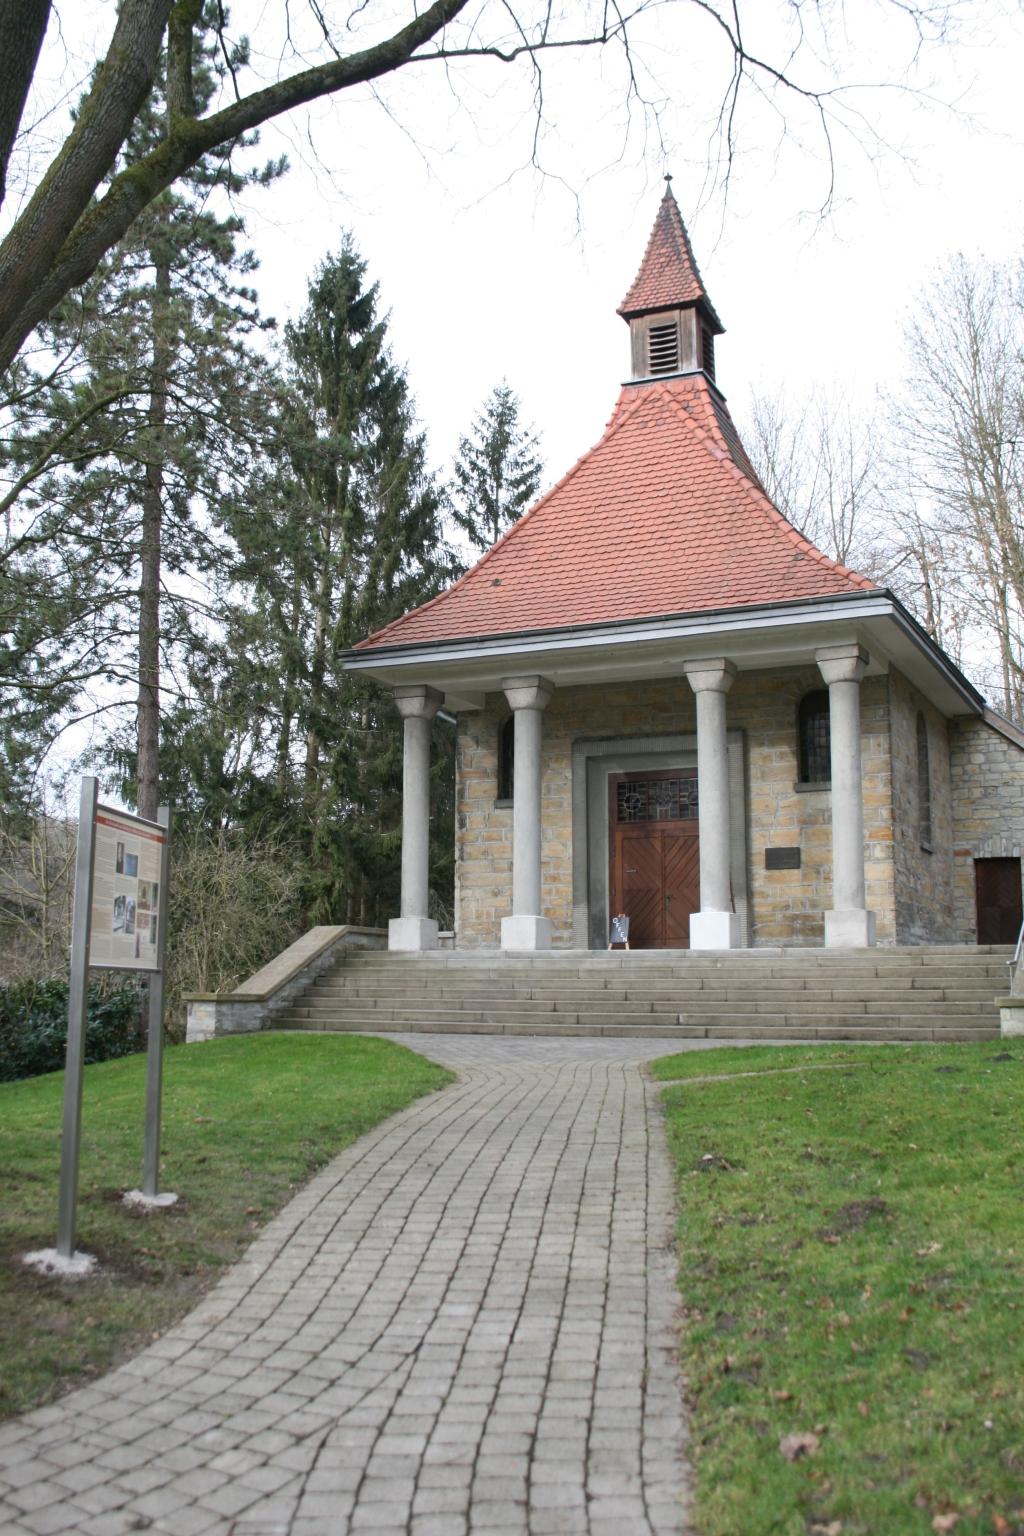 Kluskapelle Ahden mit Schild